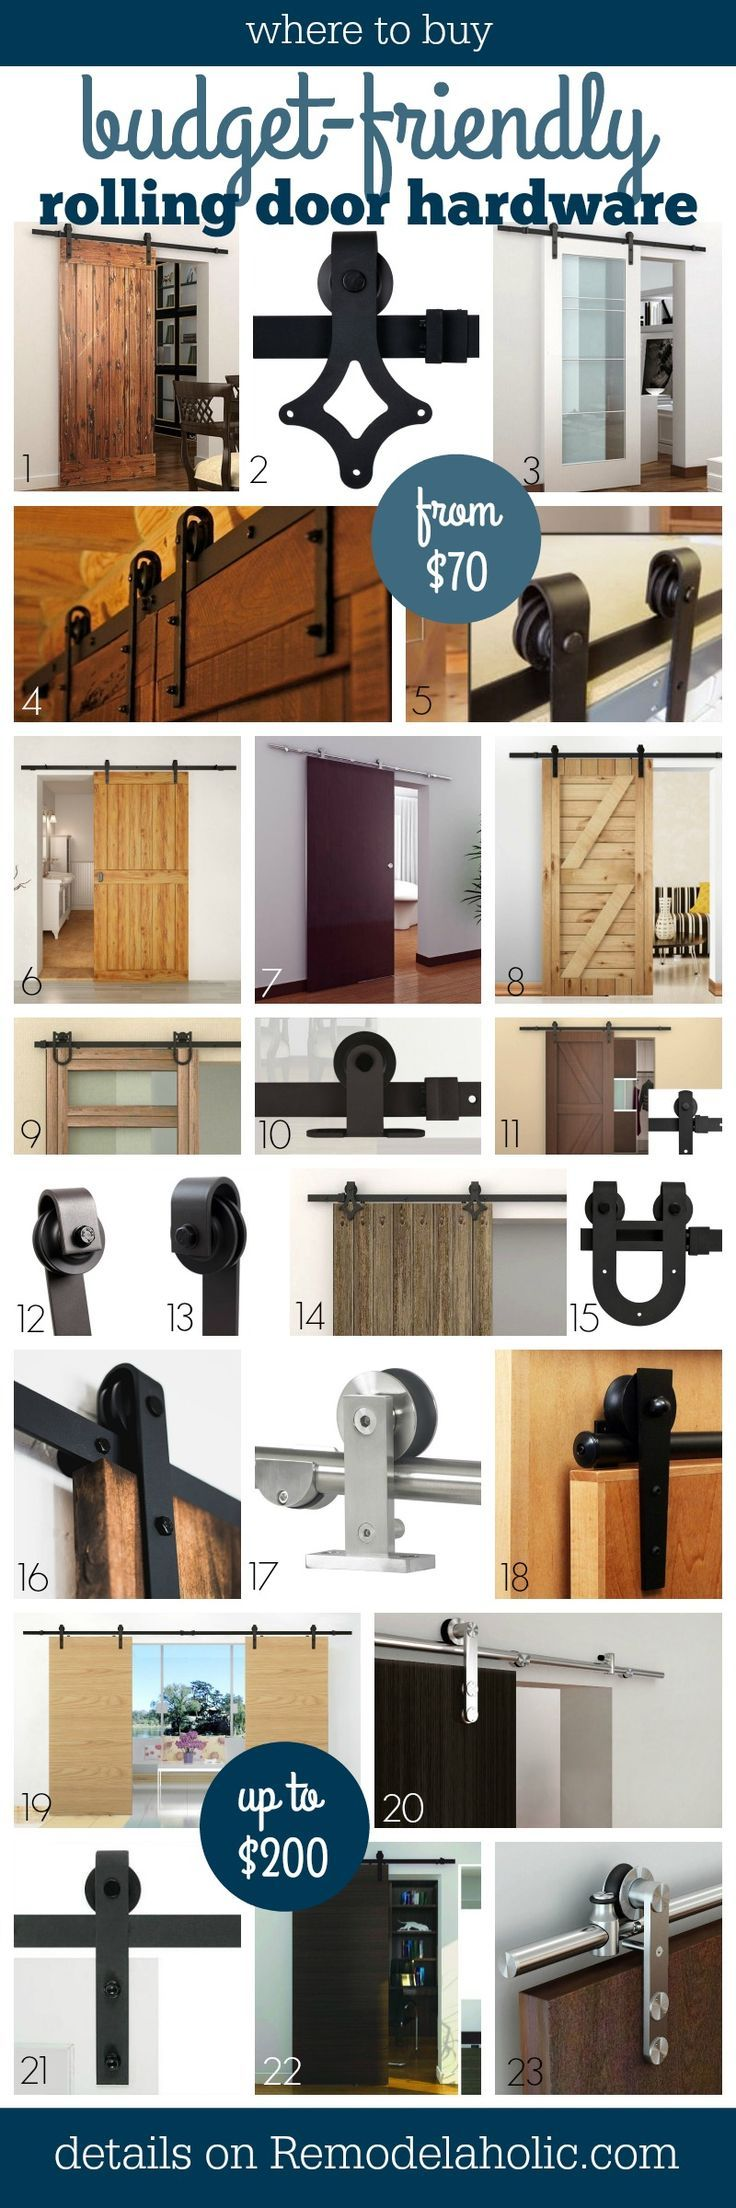 Where to buy budgetfriendly rolling door hardware for barn doors